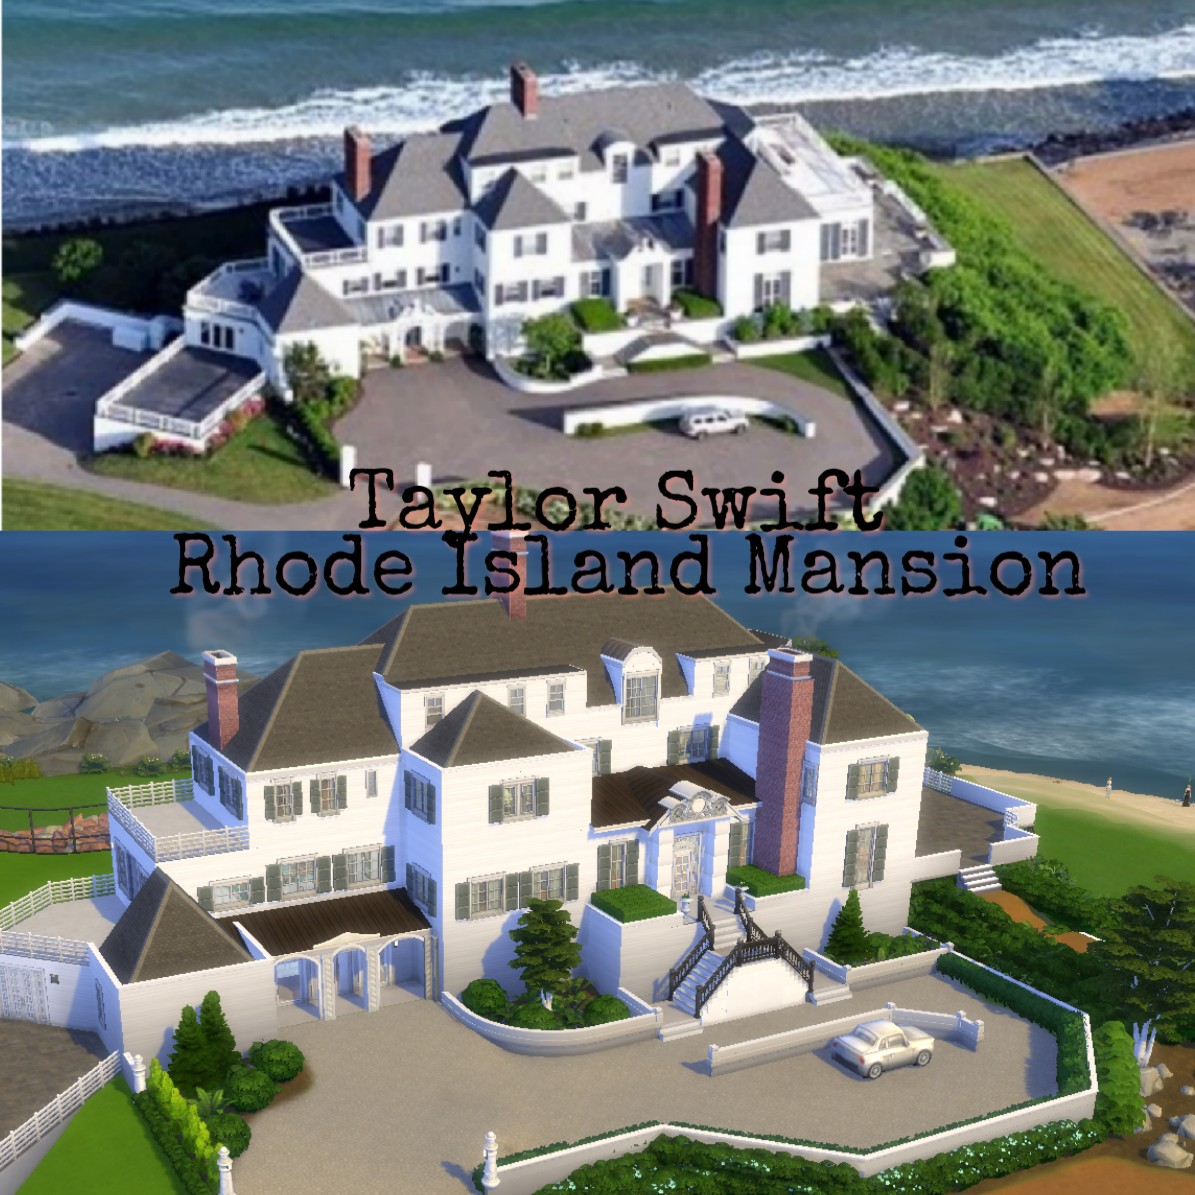 Rhode Island Mansion (Taylor Swift)